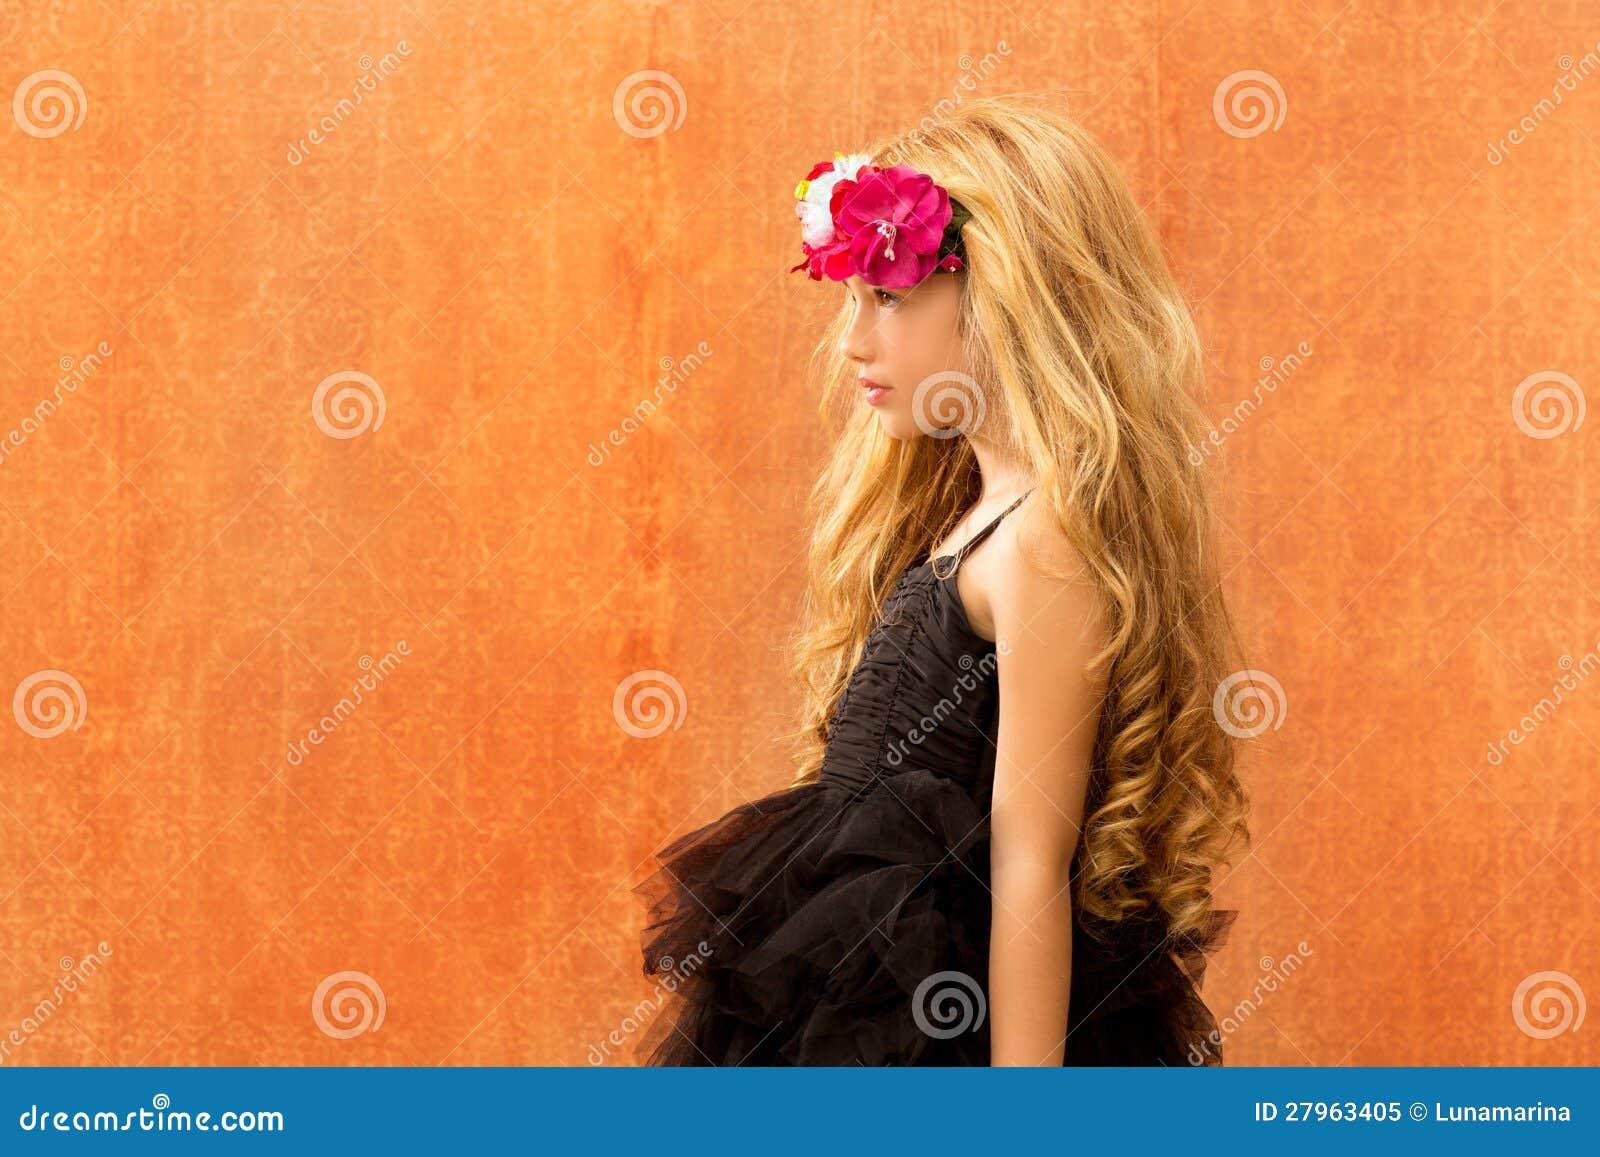 Vintage Retro Background Of Girl Profile Stock Photo ...